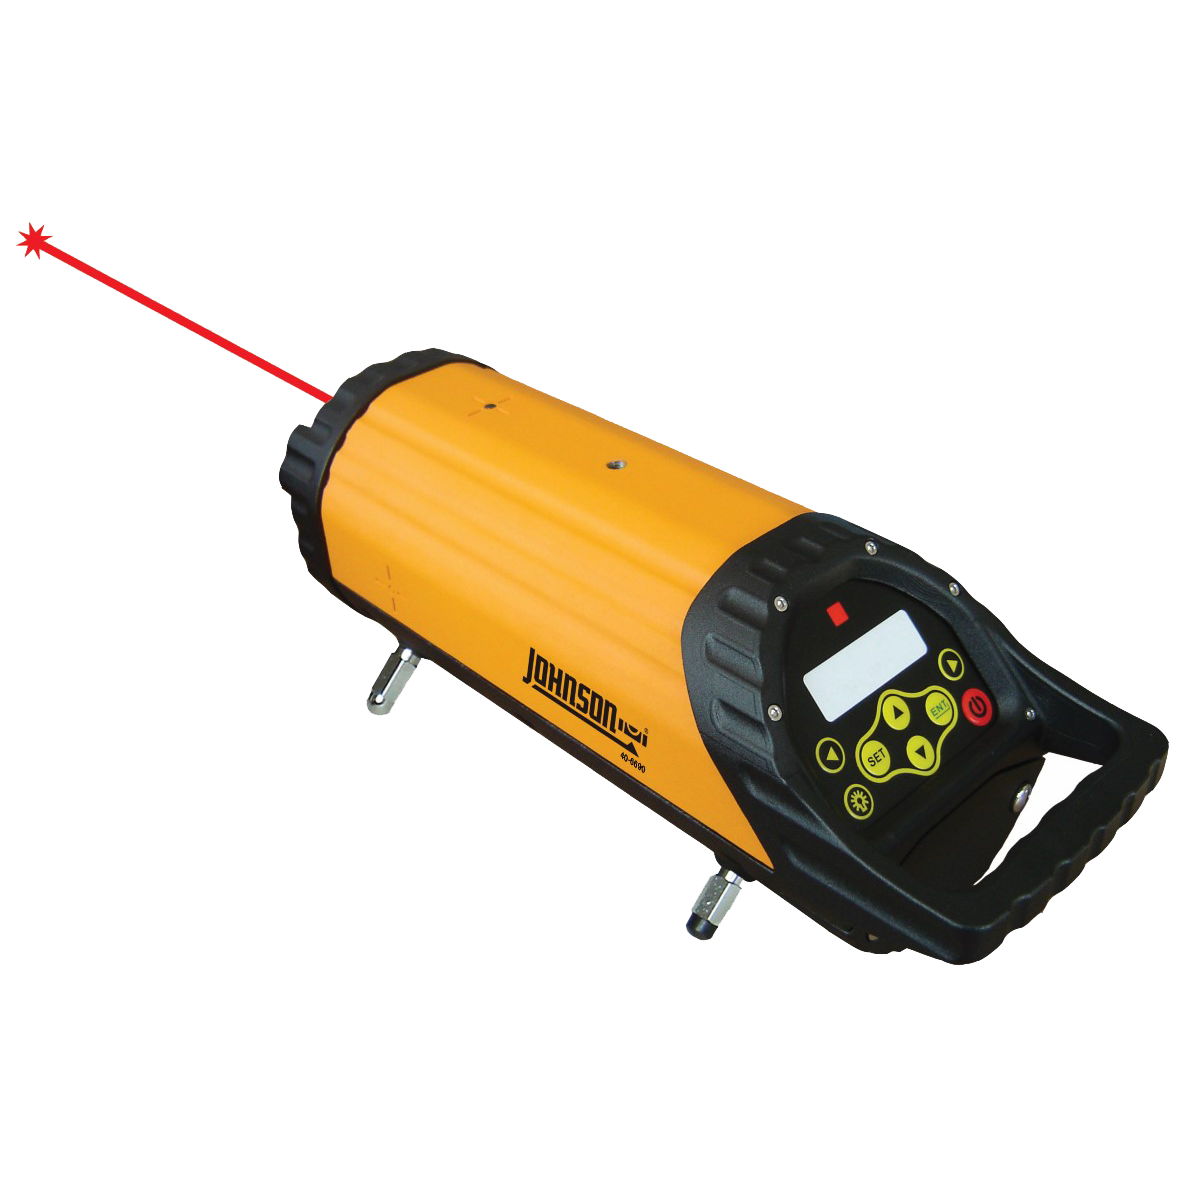 Self Leveling Tools : Electronic self leveling pipe laser johnson